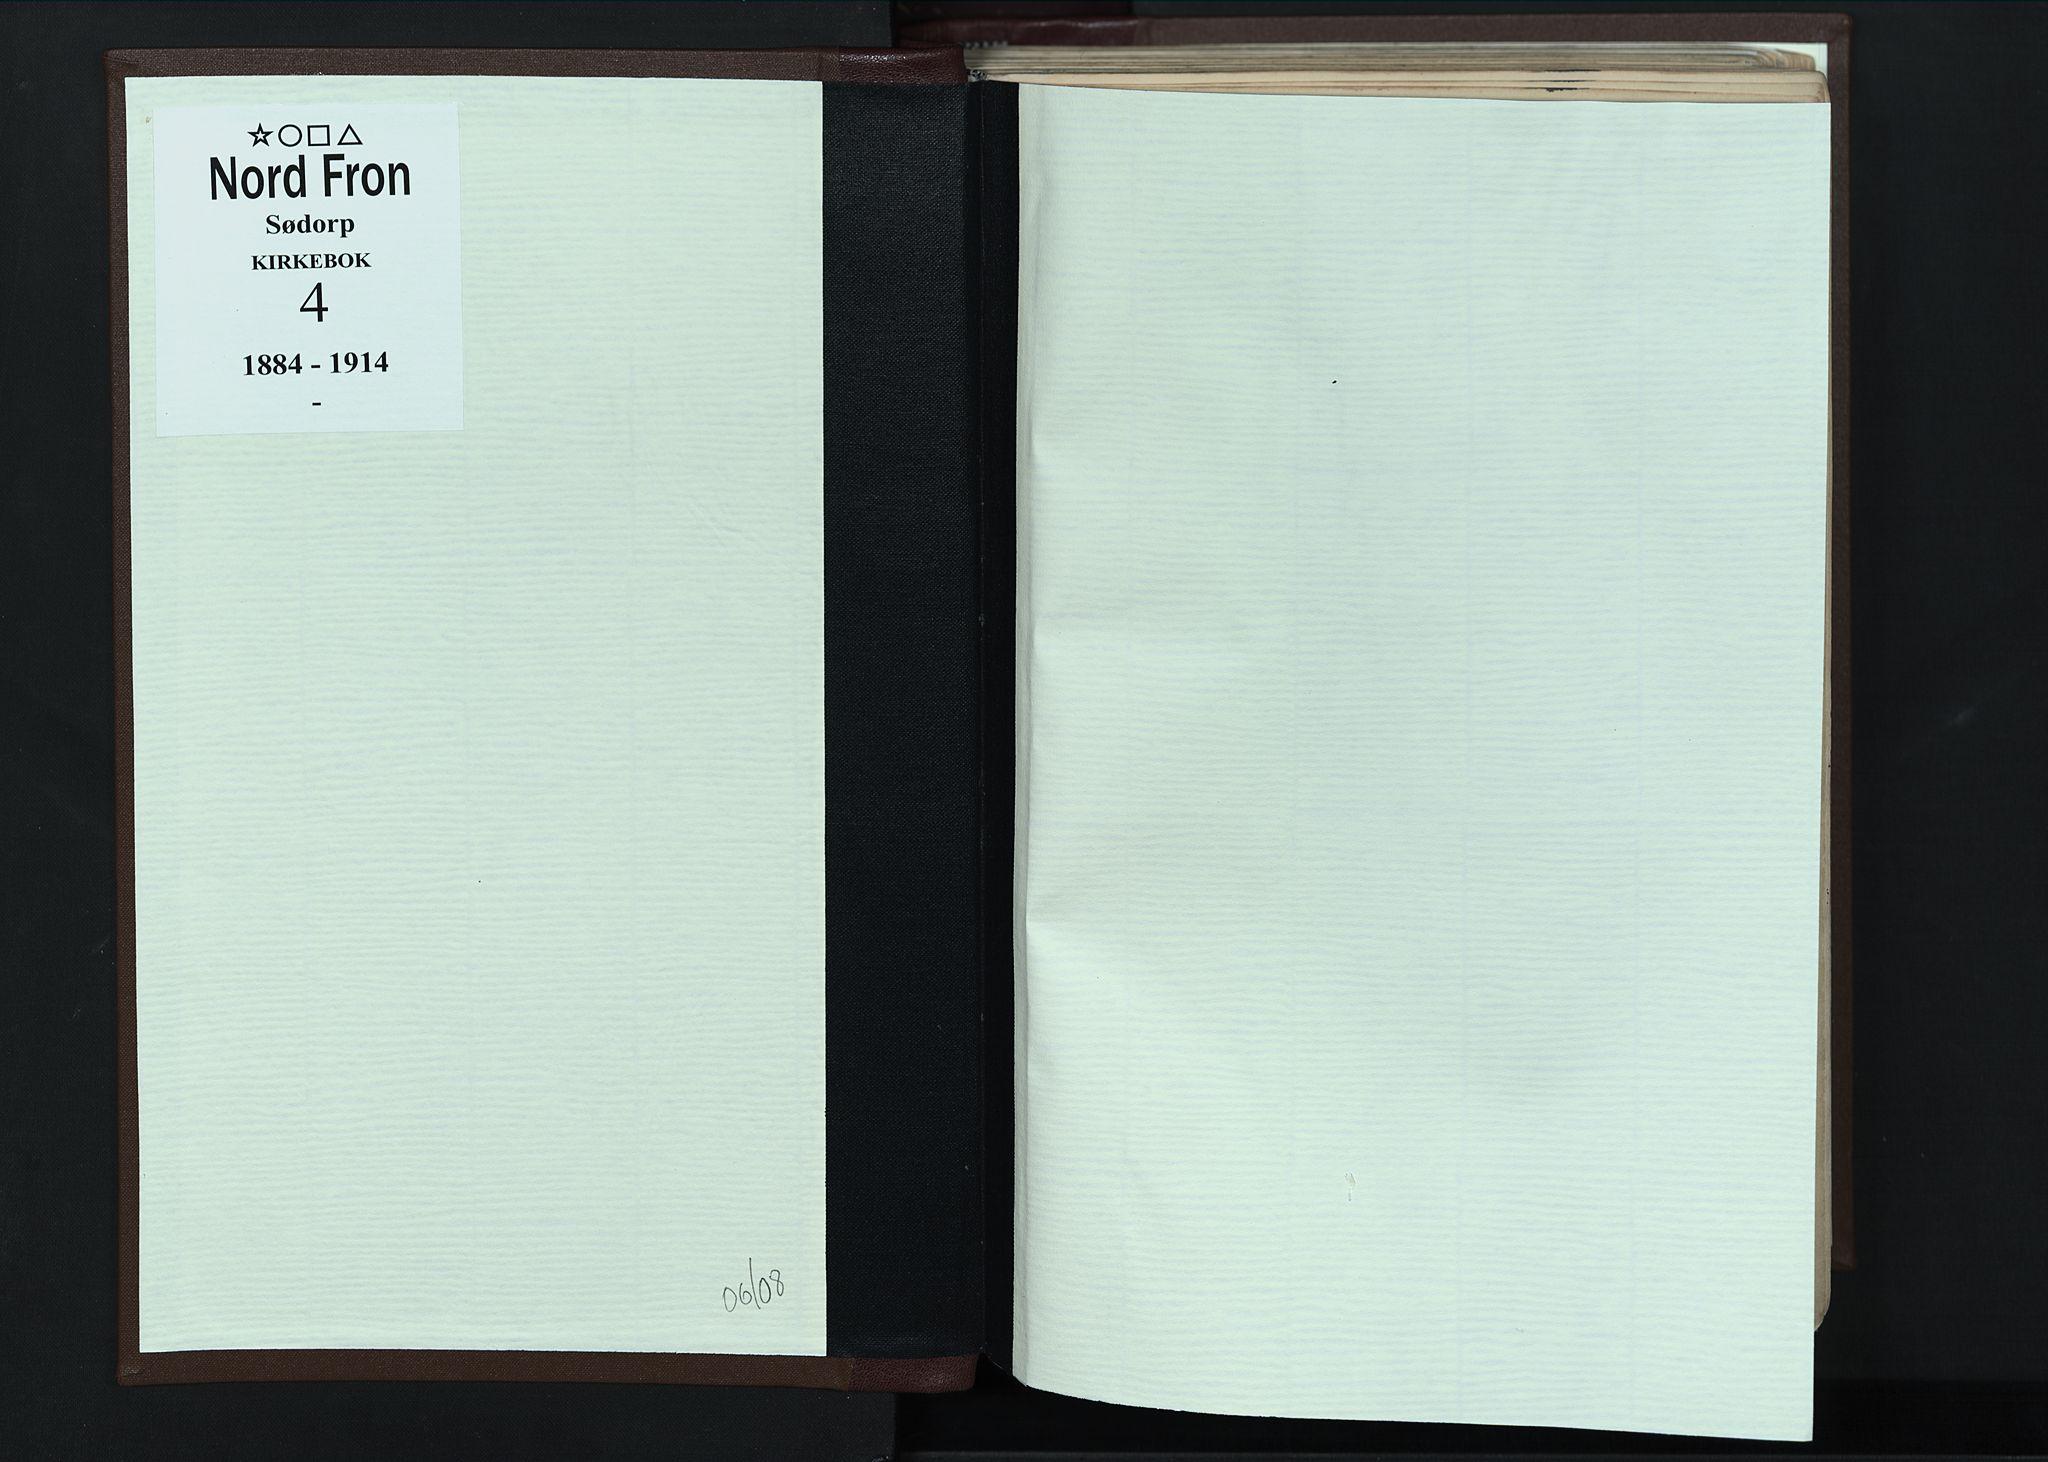 SAH, Nord-Fron prestekontor, Ministerialbok nr. 4, 1884-1914